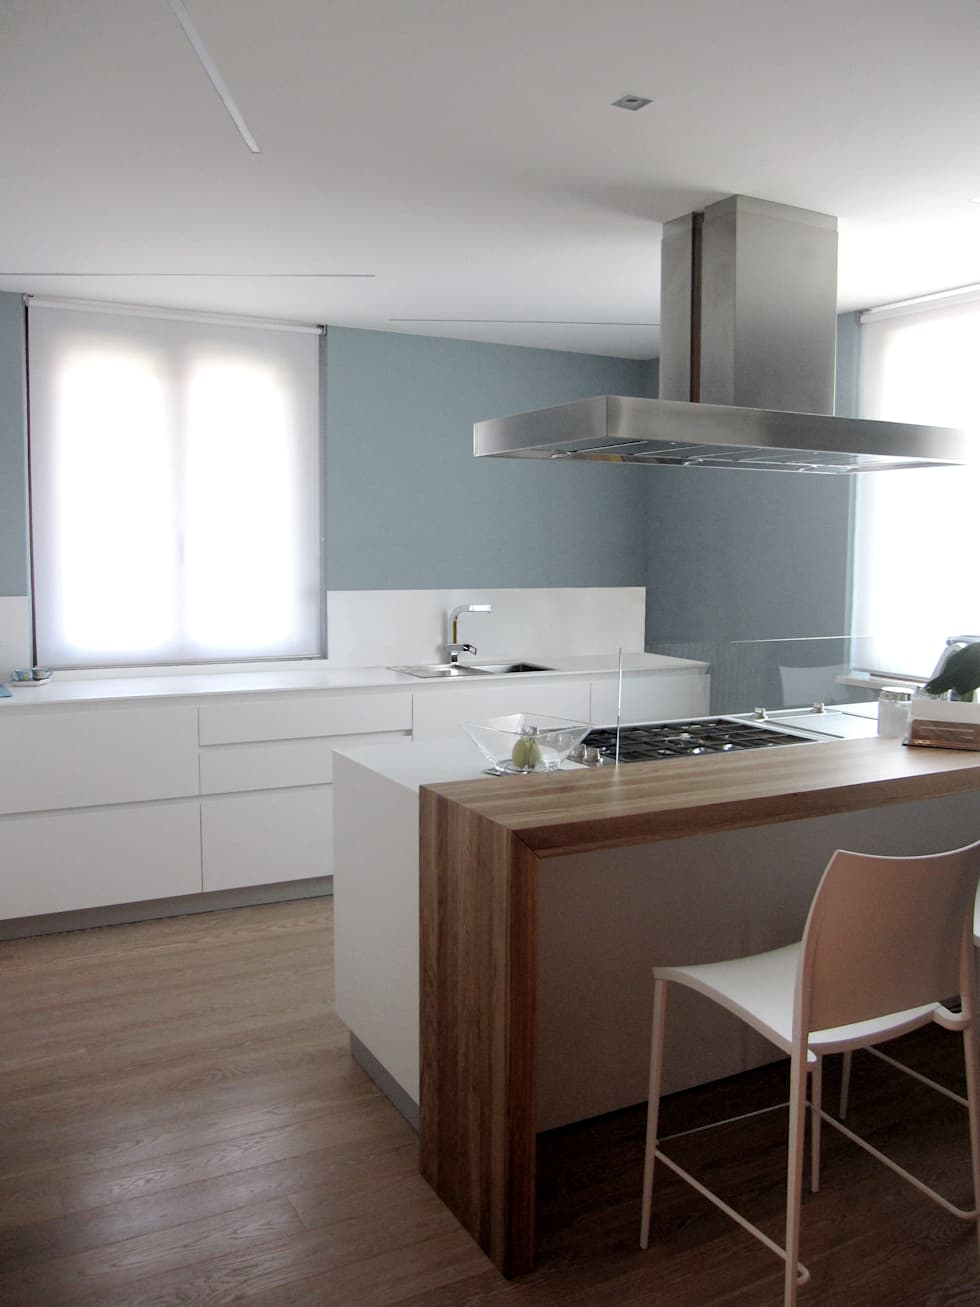 cucina con penisola: Cucina in stile in stile Moderno di studio radicediuno